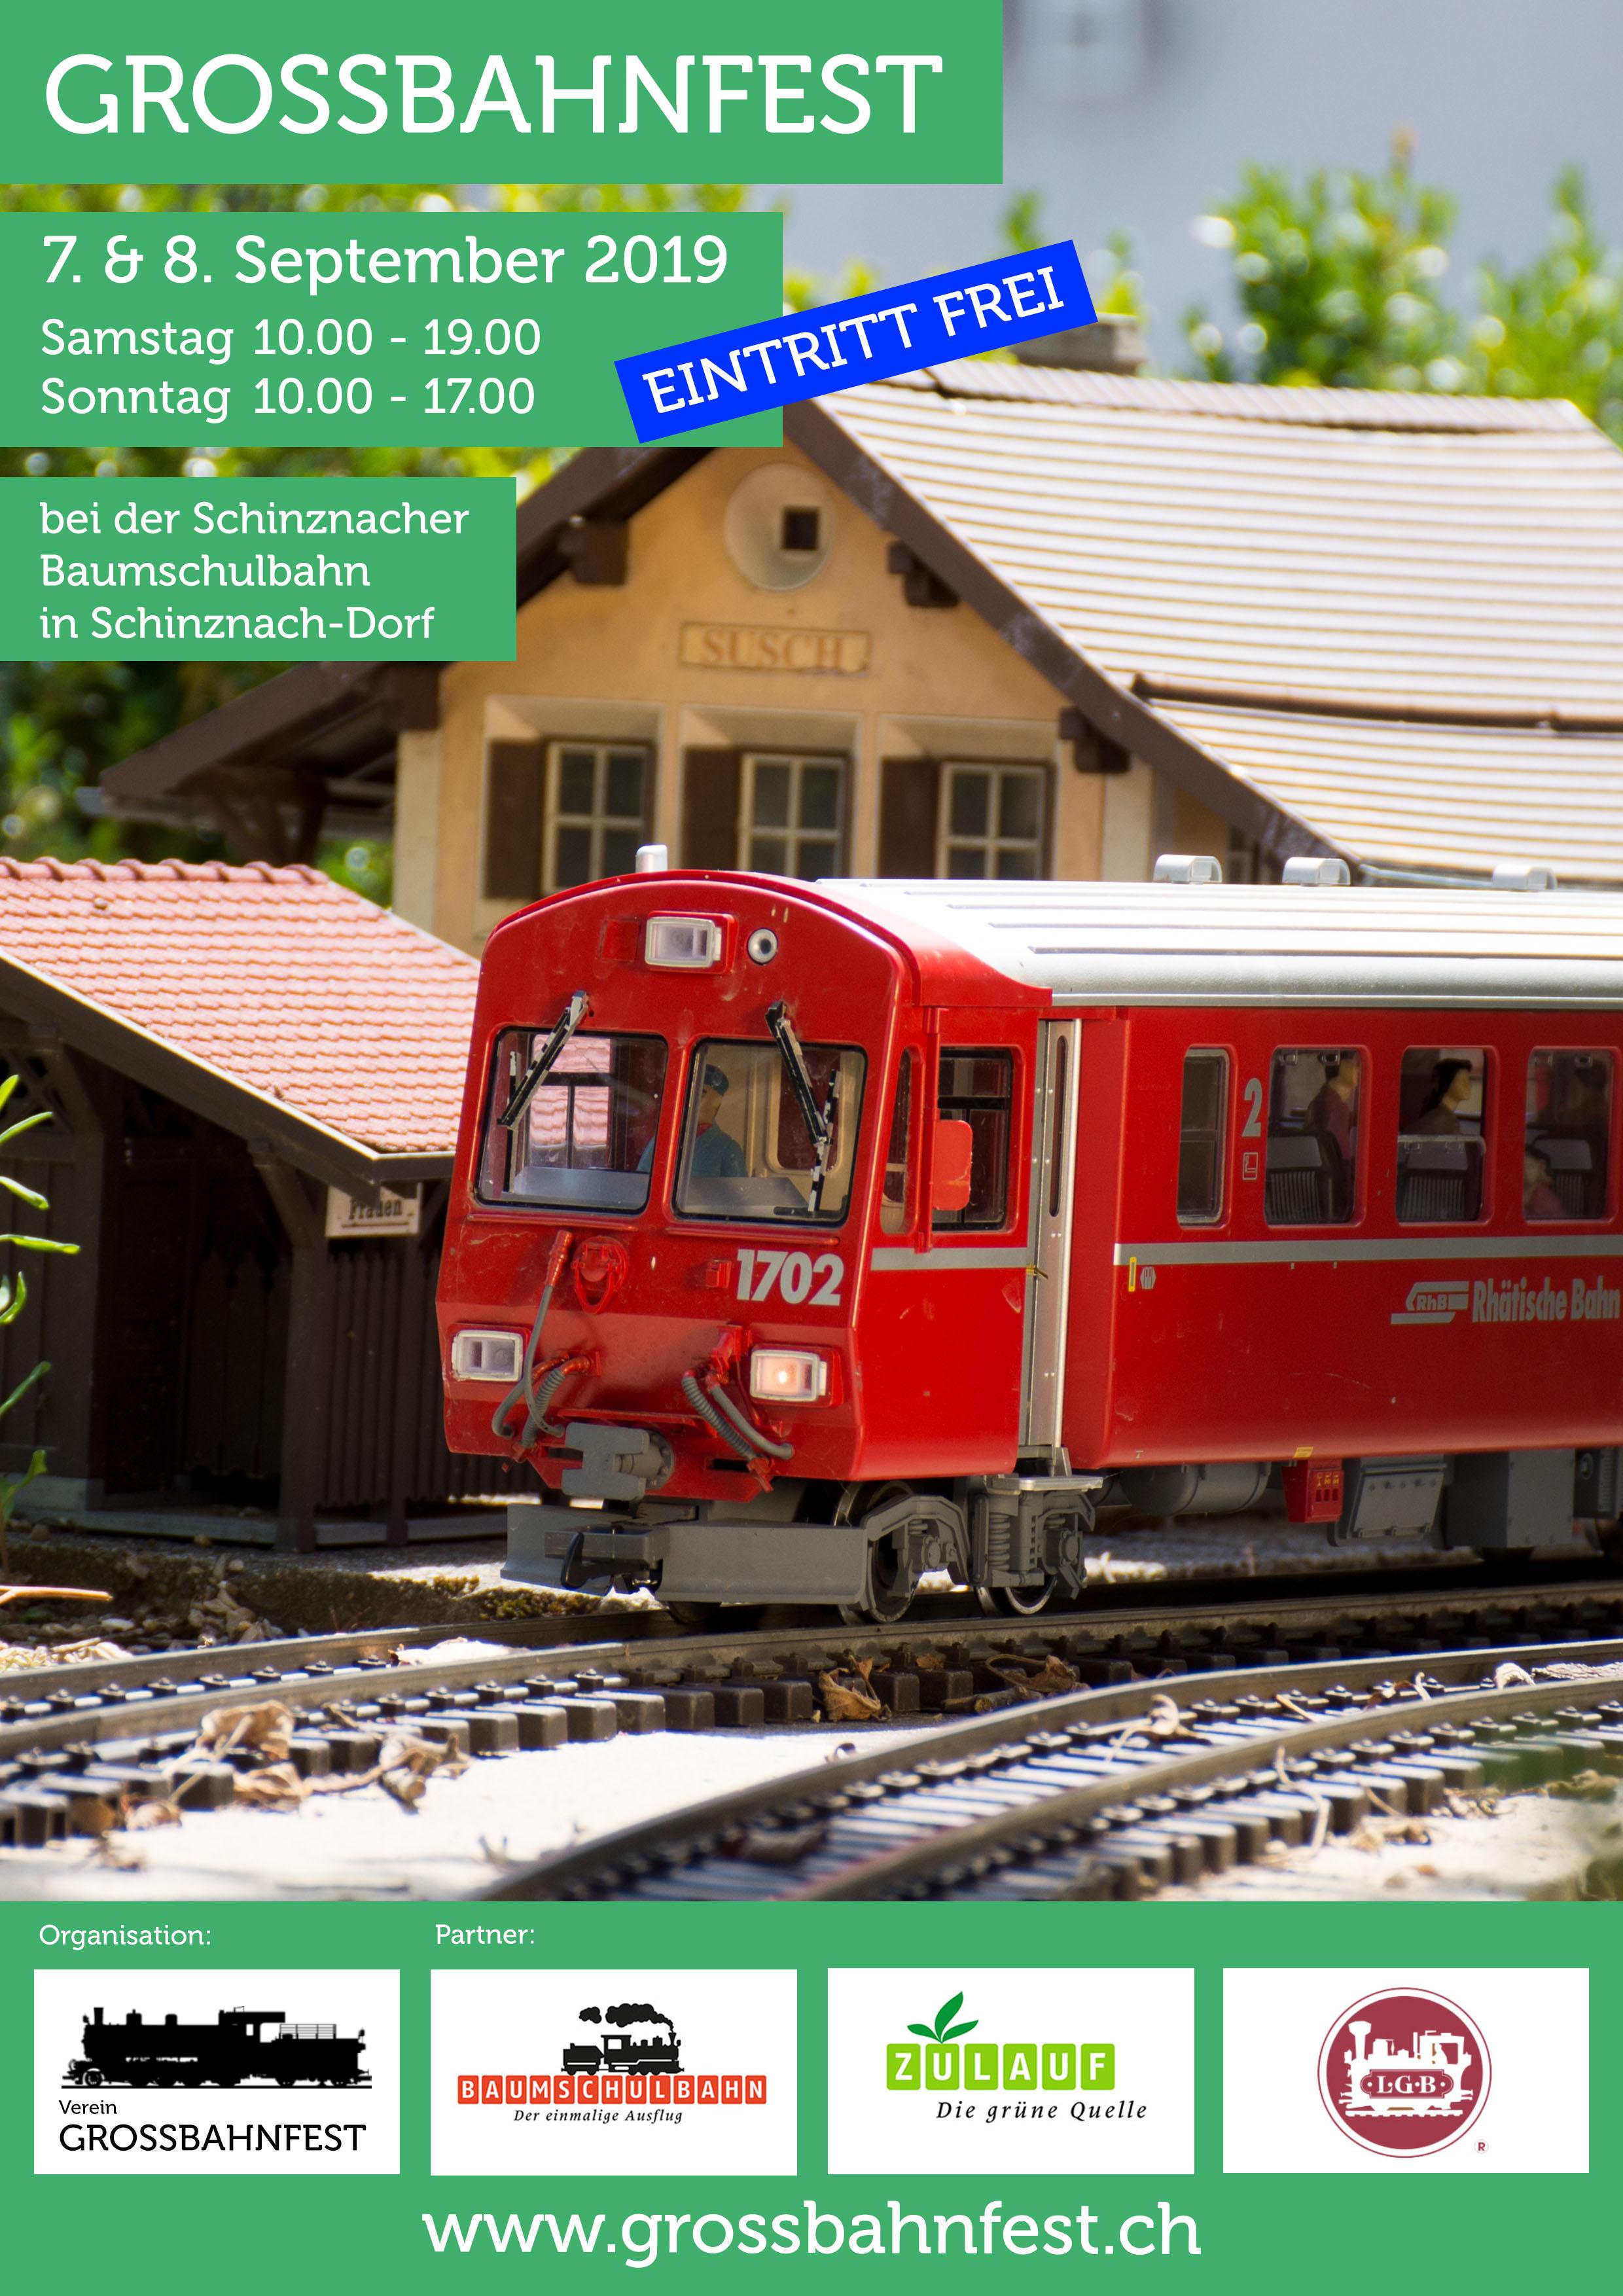 Flyer Grossbahnfest Baumschulbahn Schinznach 2019